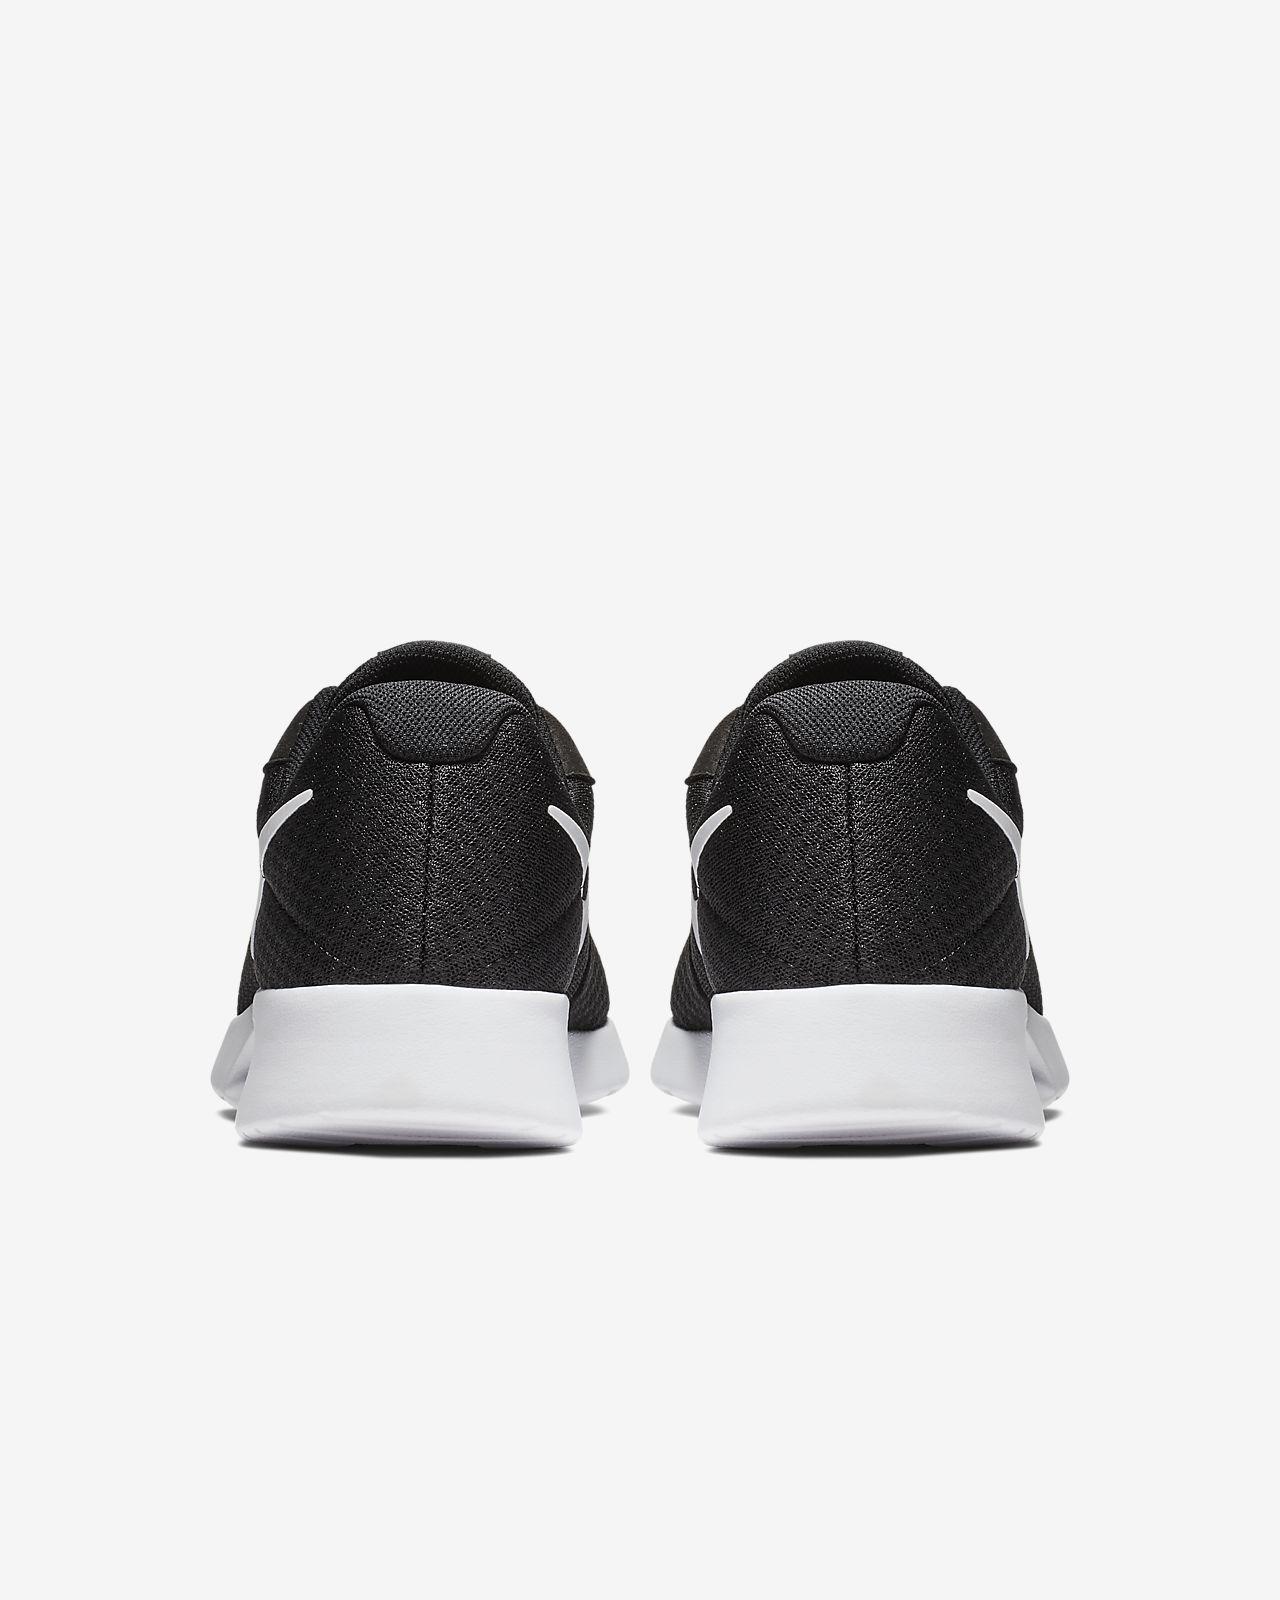 d8174264c2 Chaussure Nike Tanjun pour Homme. Nike.com FR